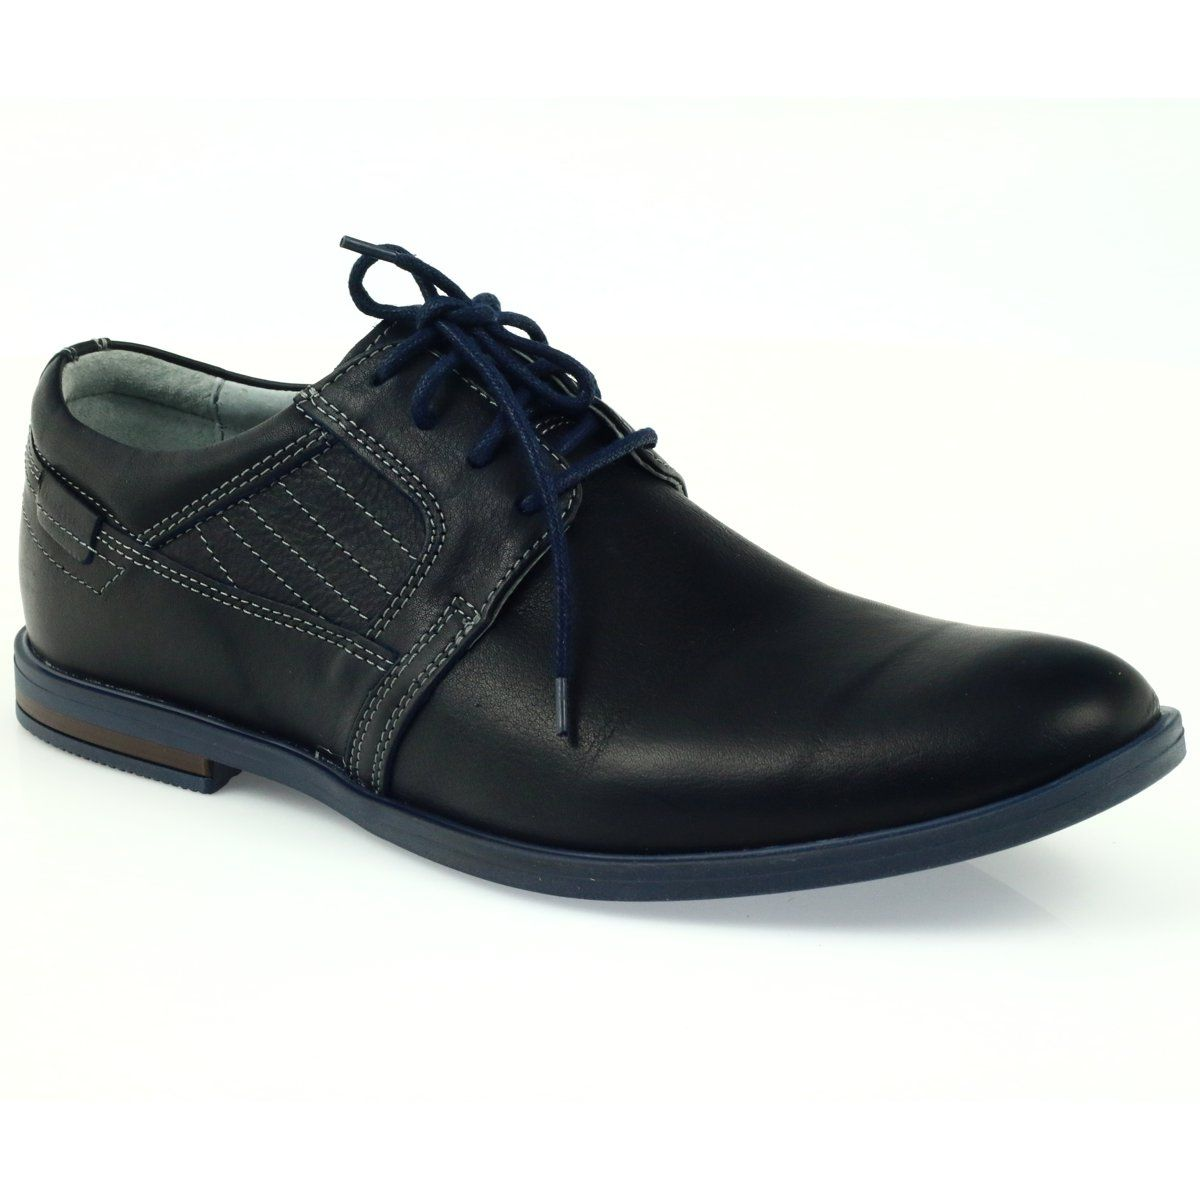 Riko Buty Meskie Polbuty Casualowe 819 Granatowe Shoes Mens Casual Shoes Dress Shoes Men